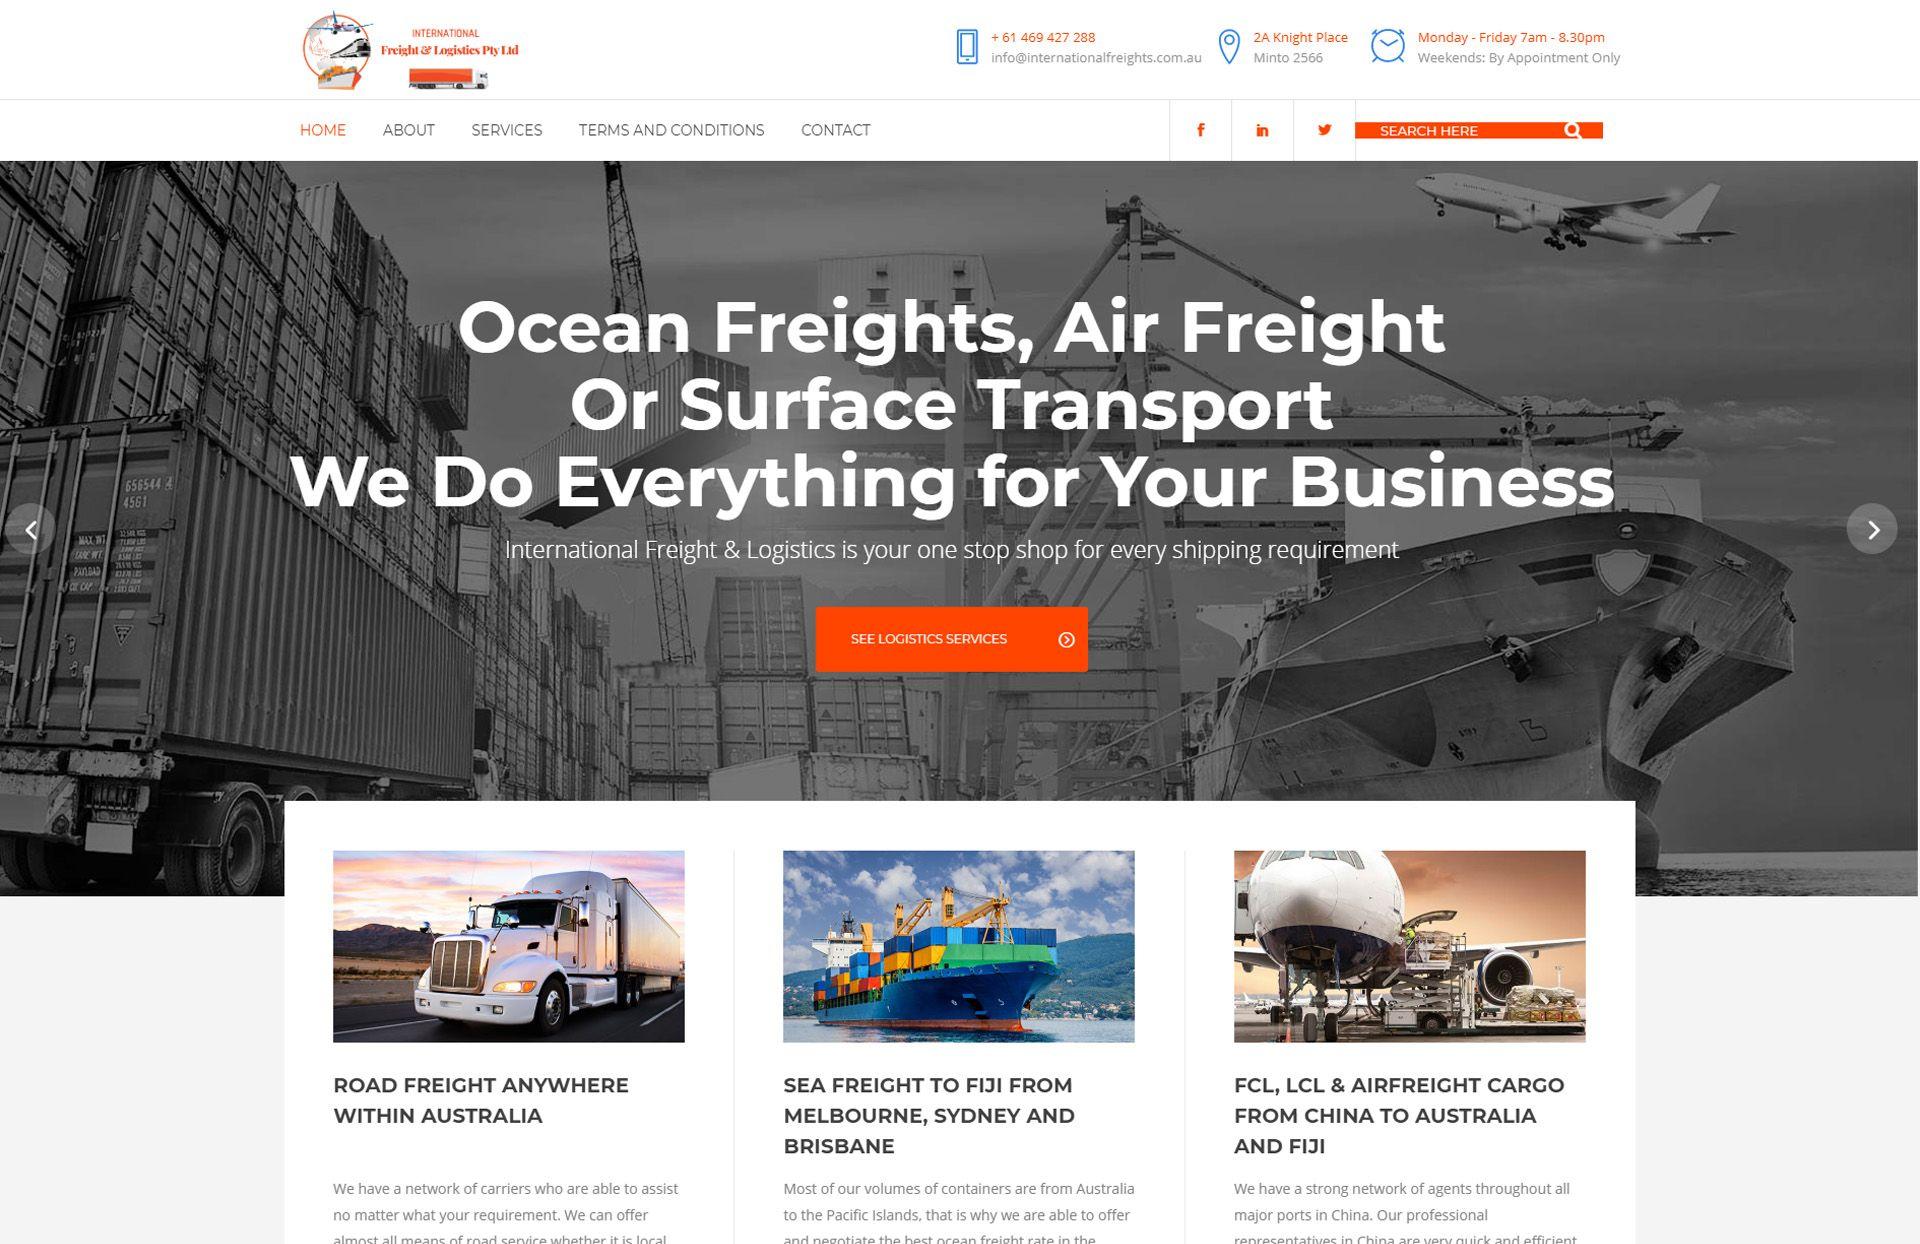 nternational Freights & Logistics image - WebGlobals